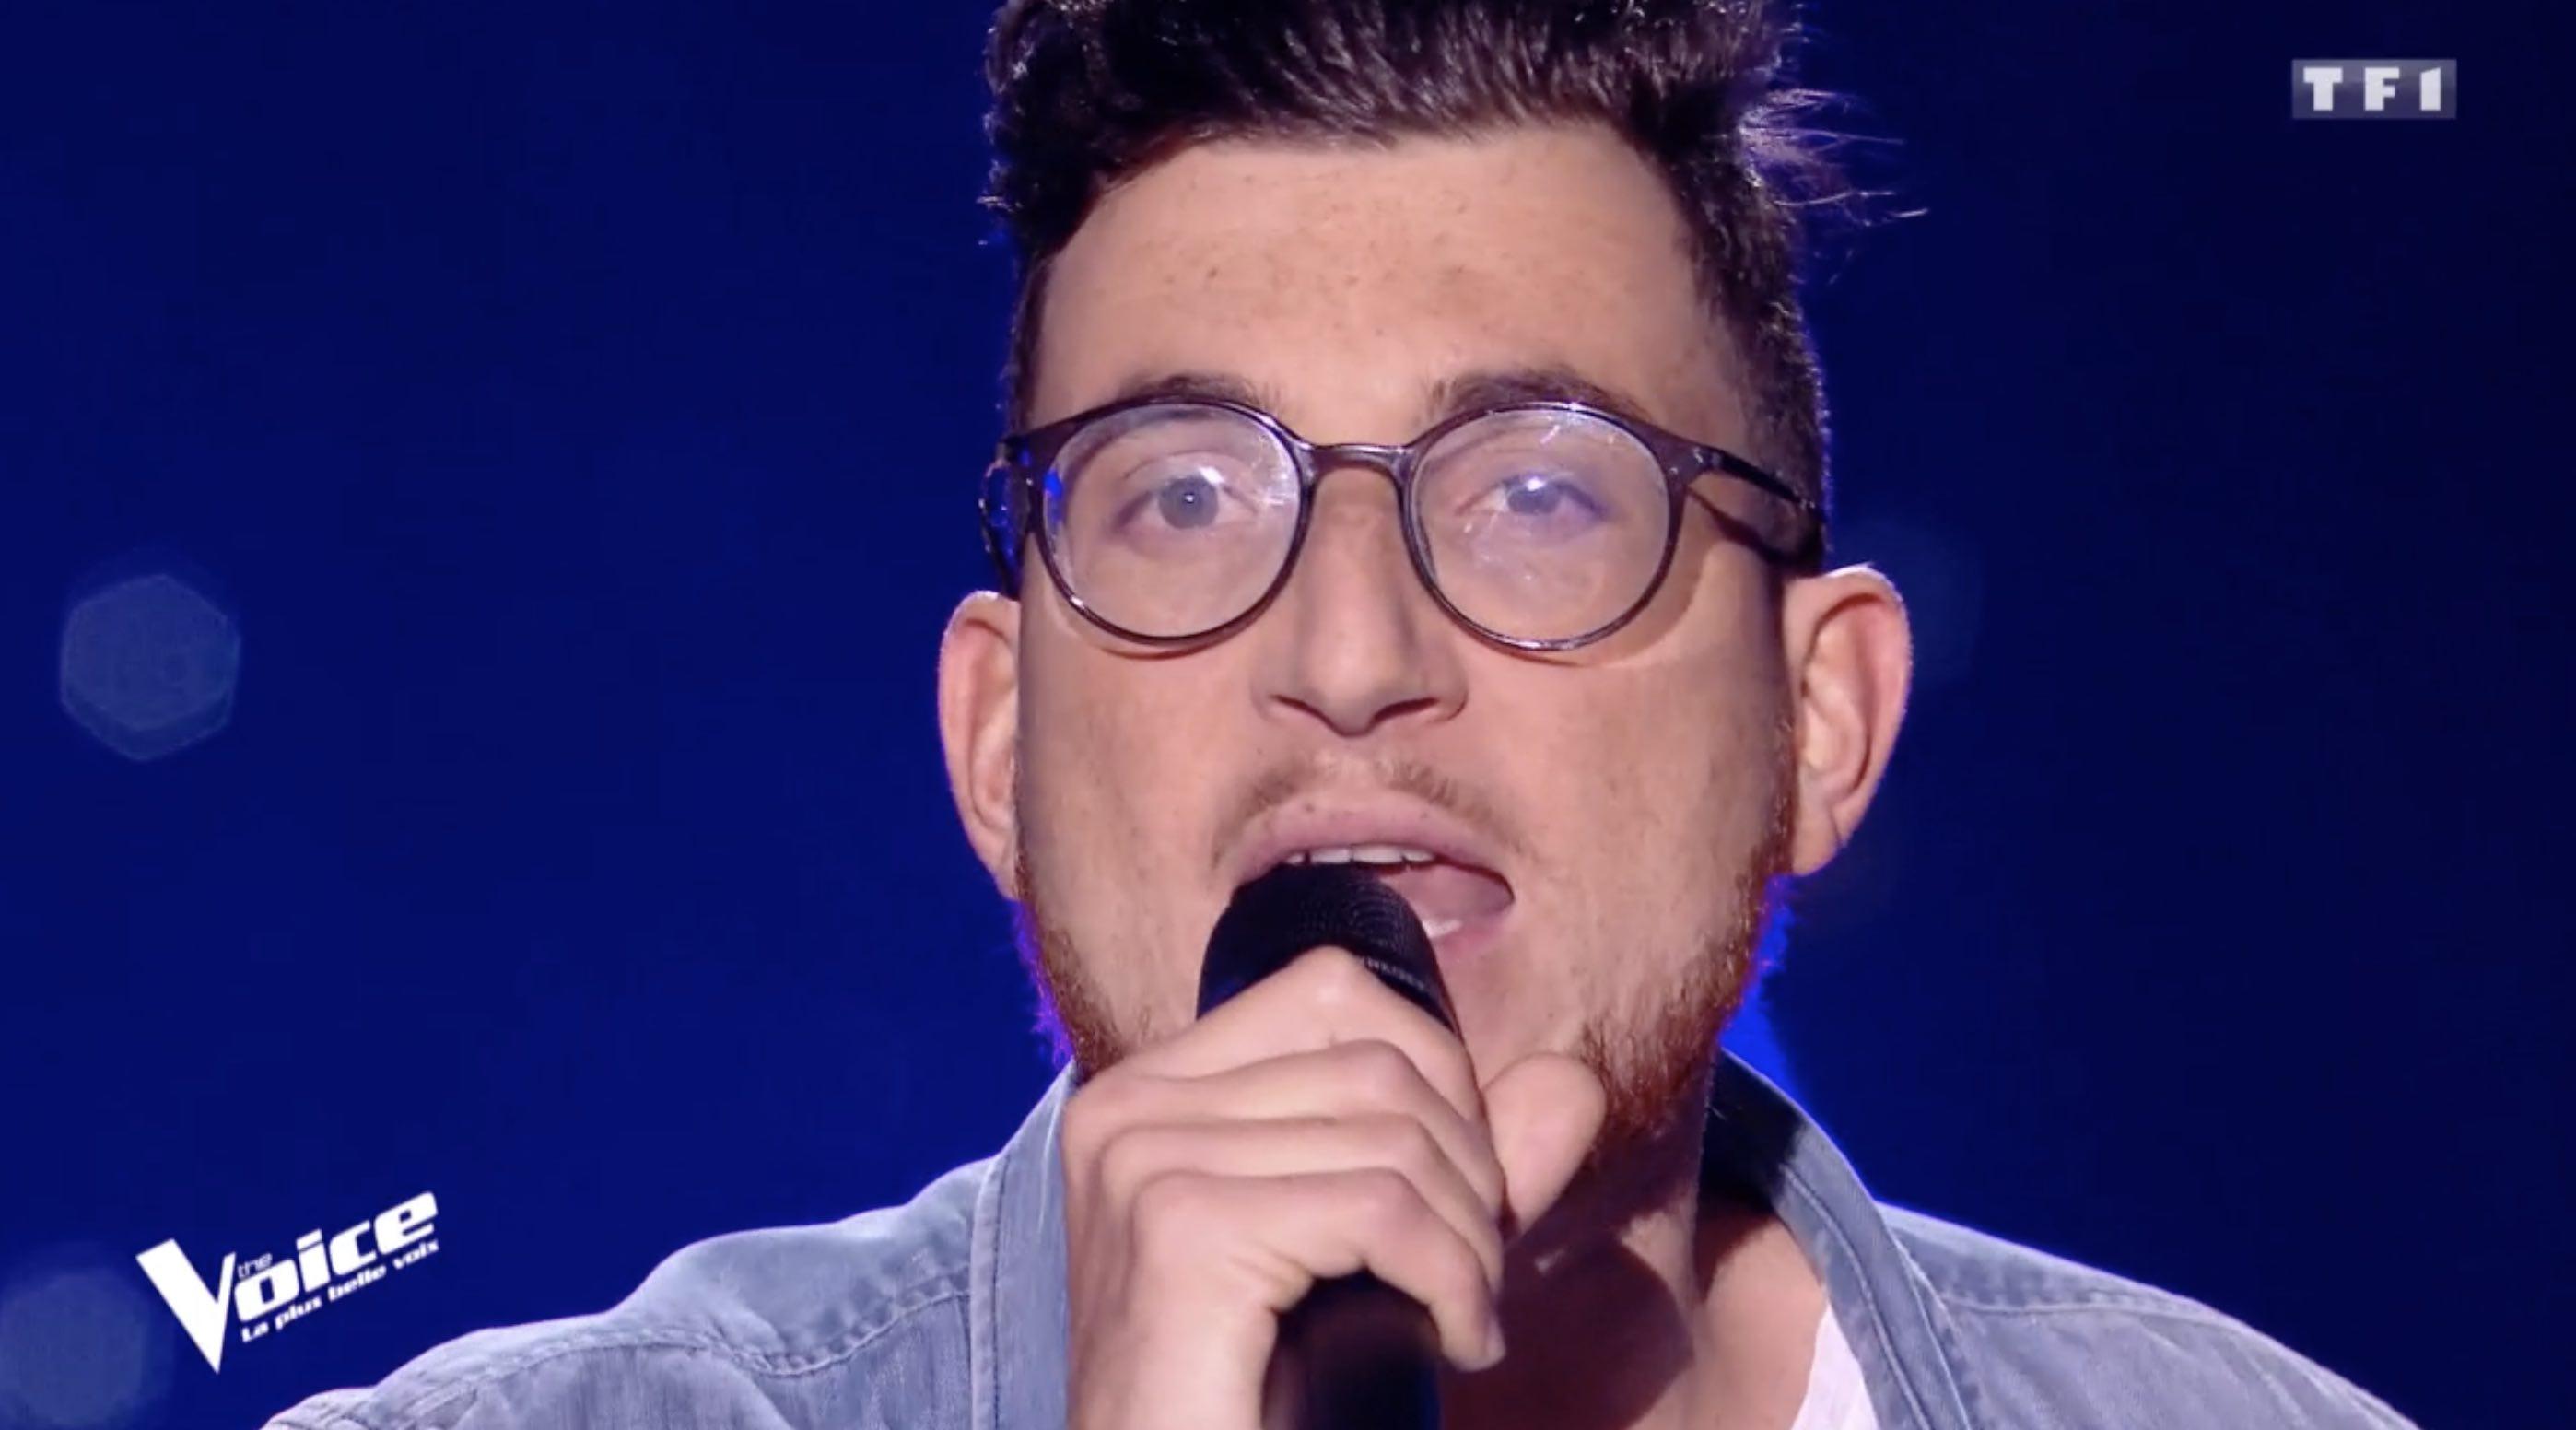 The Voice 9 - The Voice 2020 - The Voice - Jonathan Dijoux